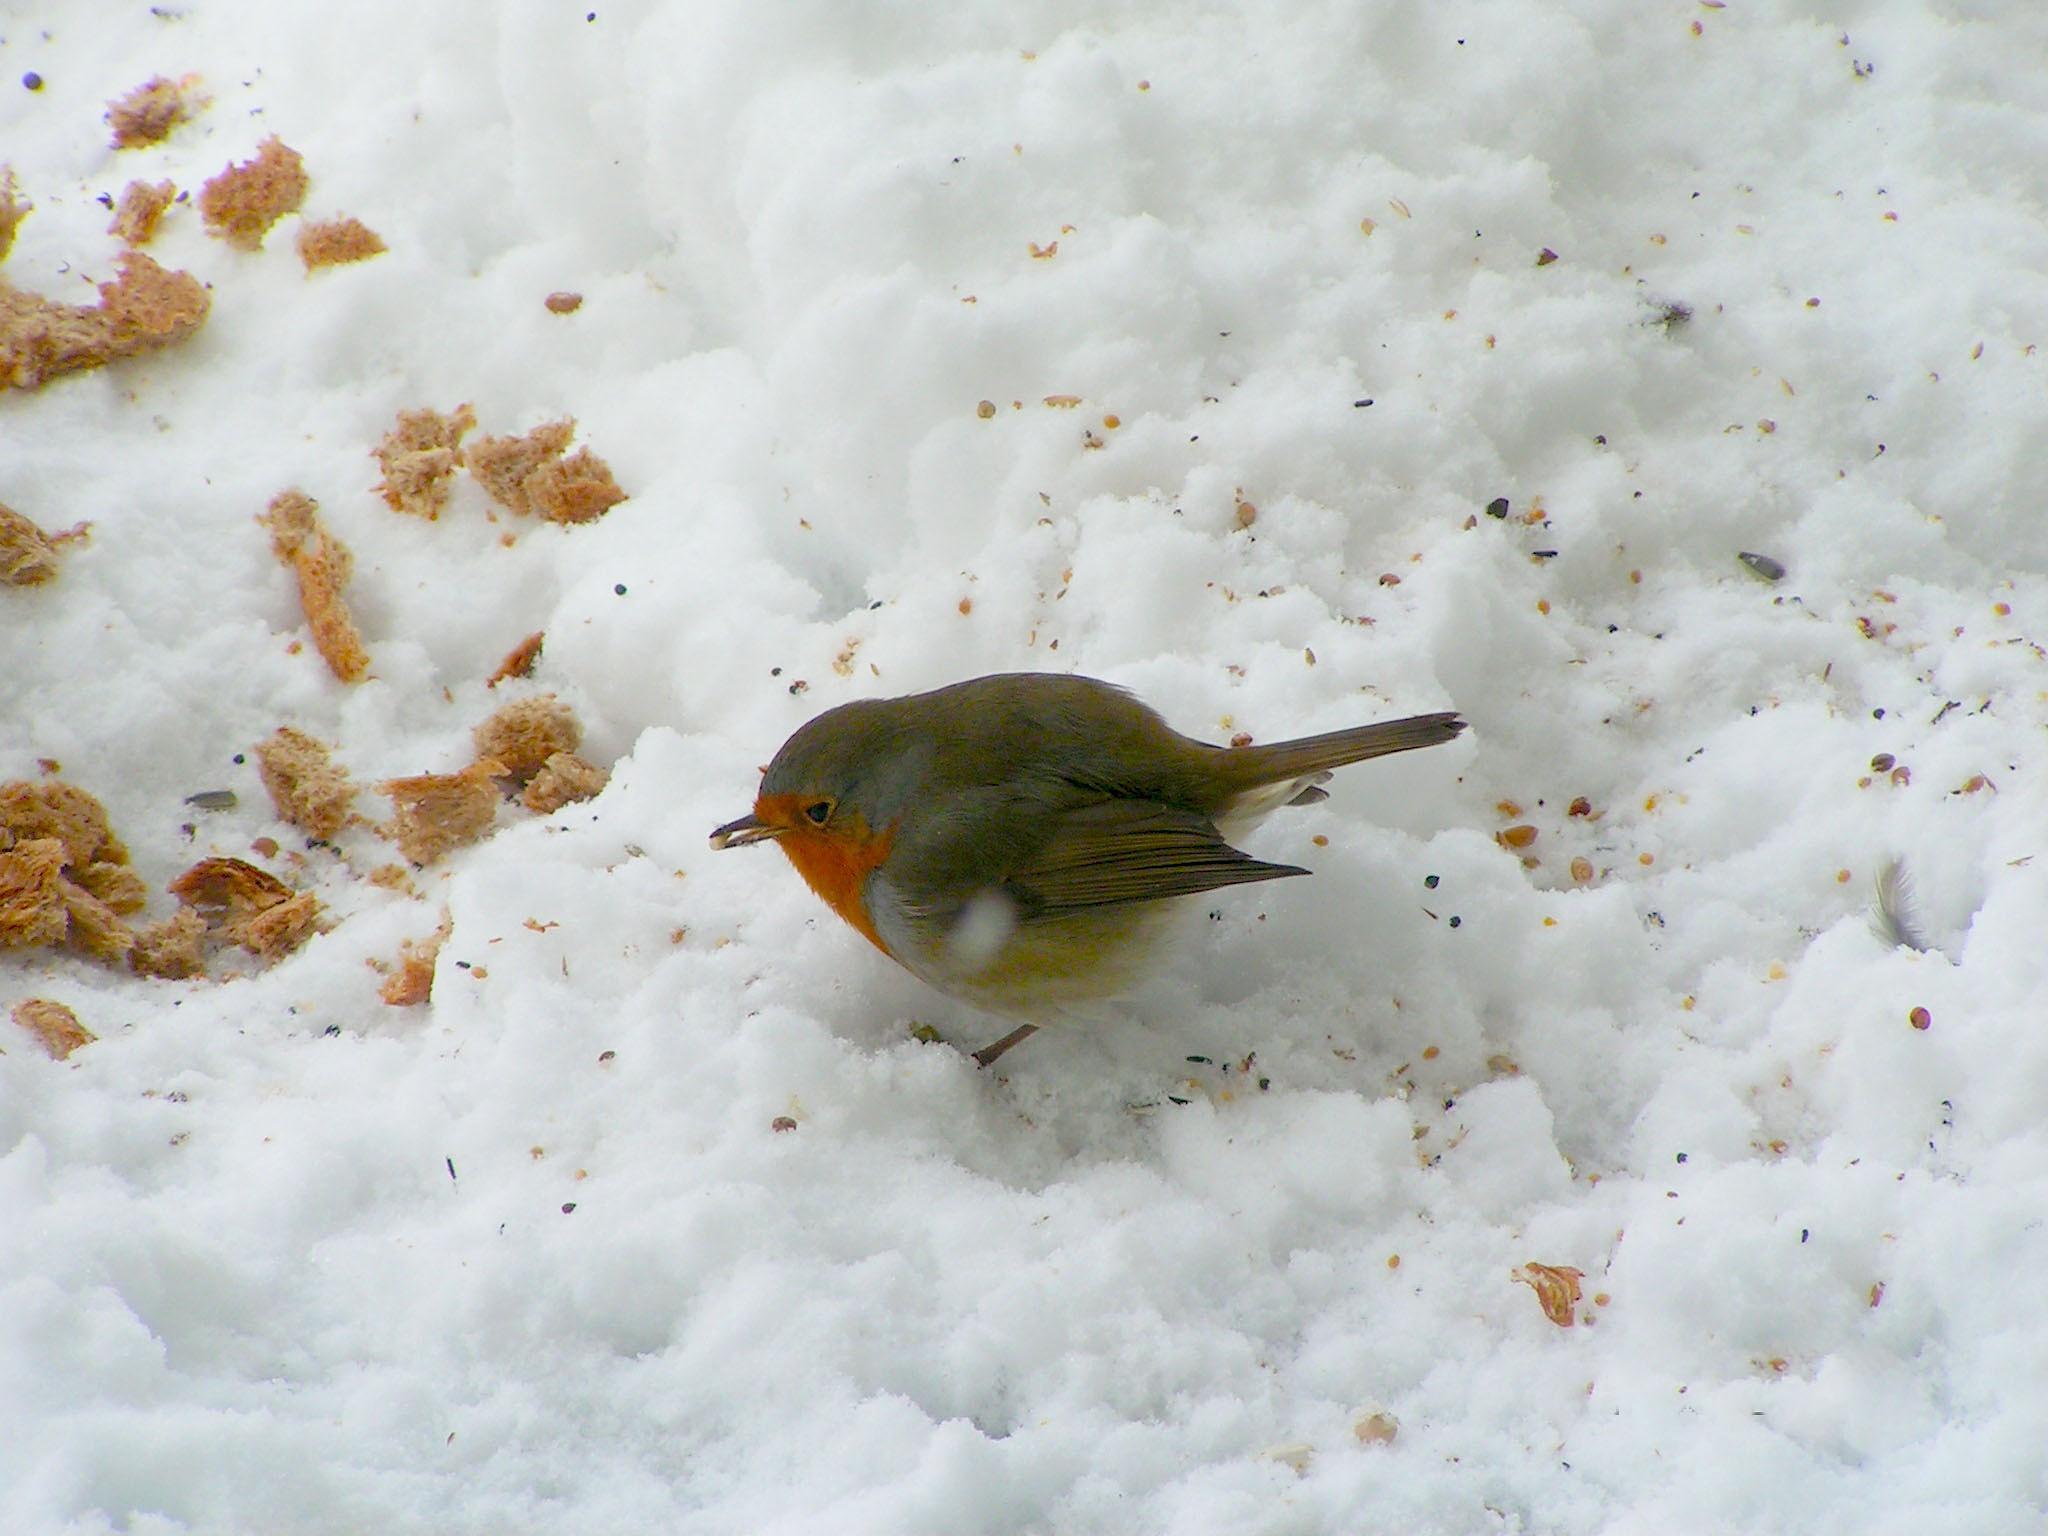 European Robin eating seeds by Roelof de Haan